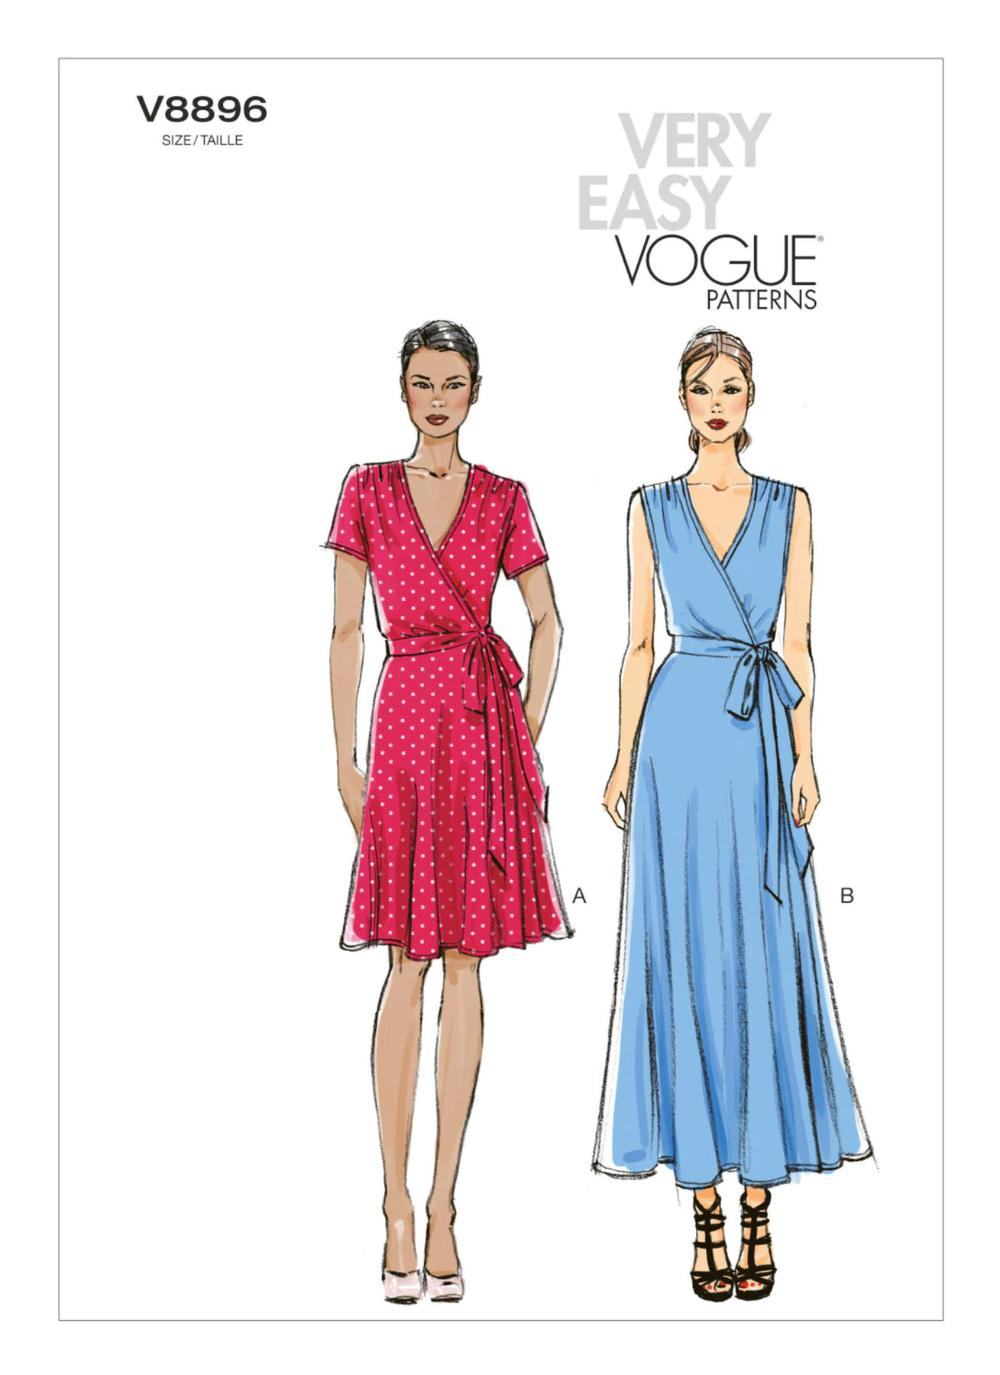 V8896 Wrap Dress Sewing Patterns Vogue Dress Patterns Vogue Patterns [ 1375 x 1000 Pixel ]